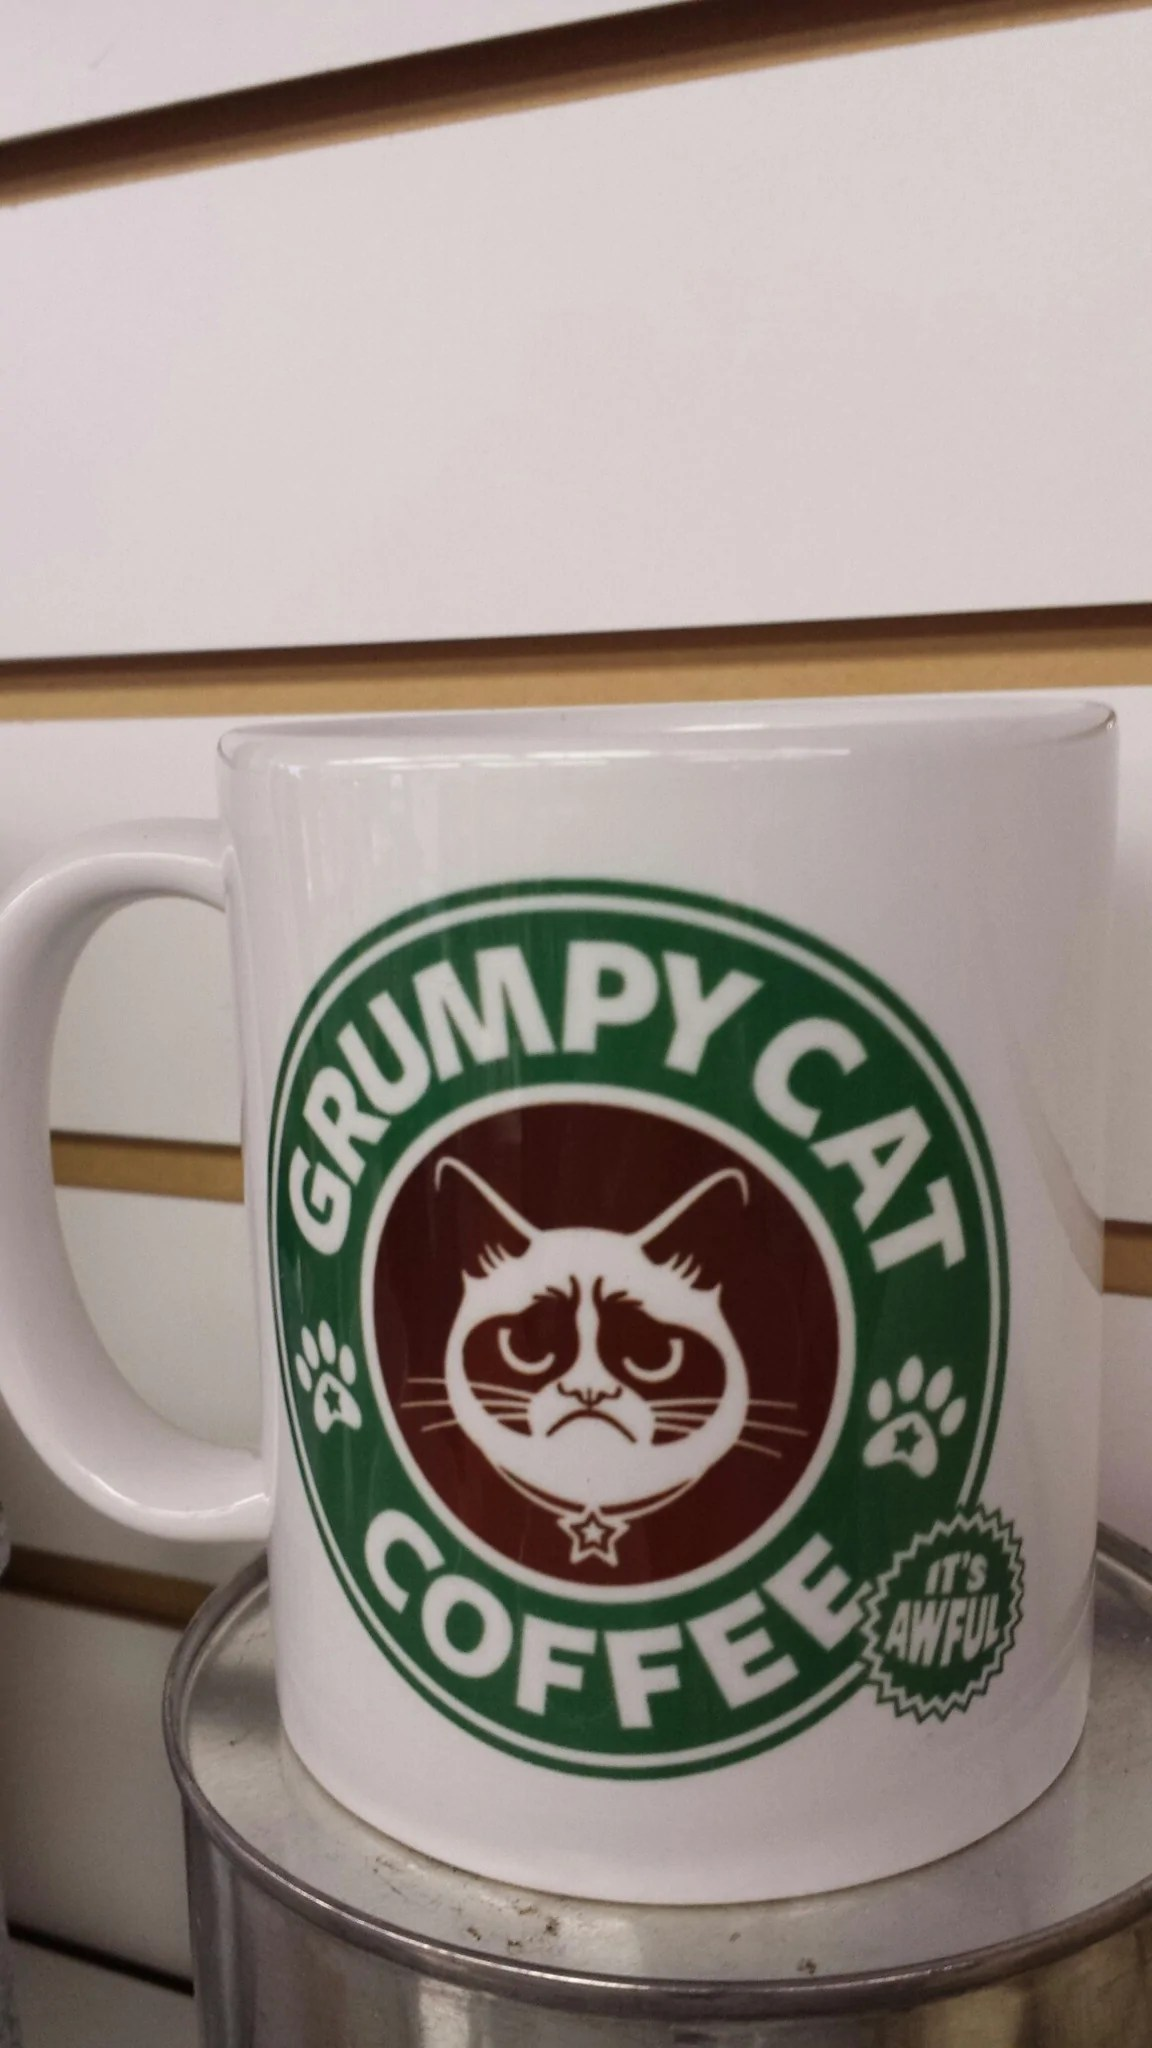 Fullsize Of Starbucks Coffee Mugs